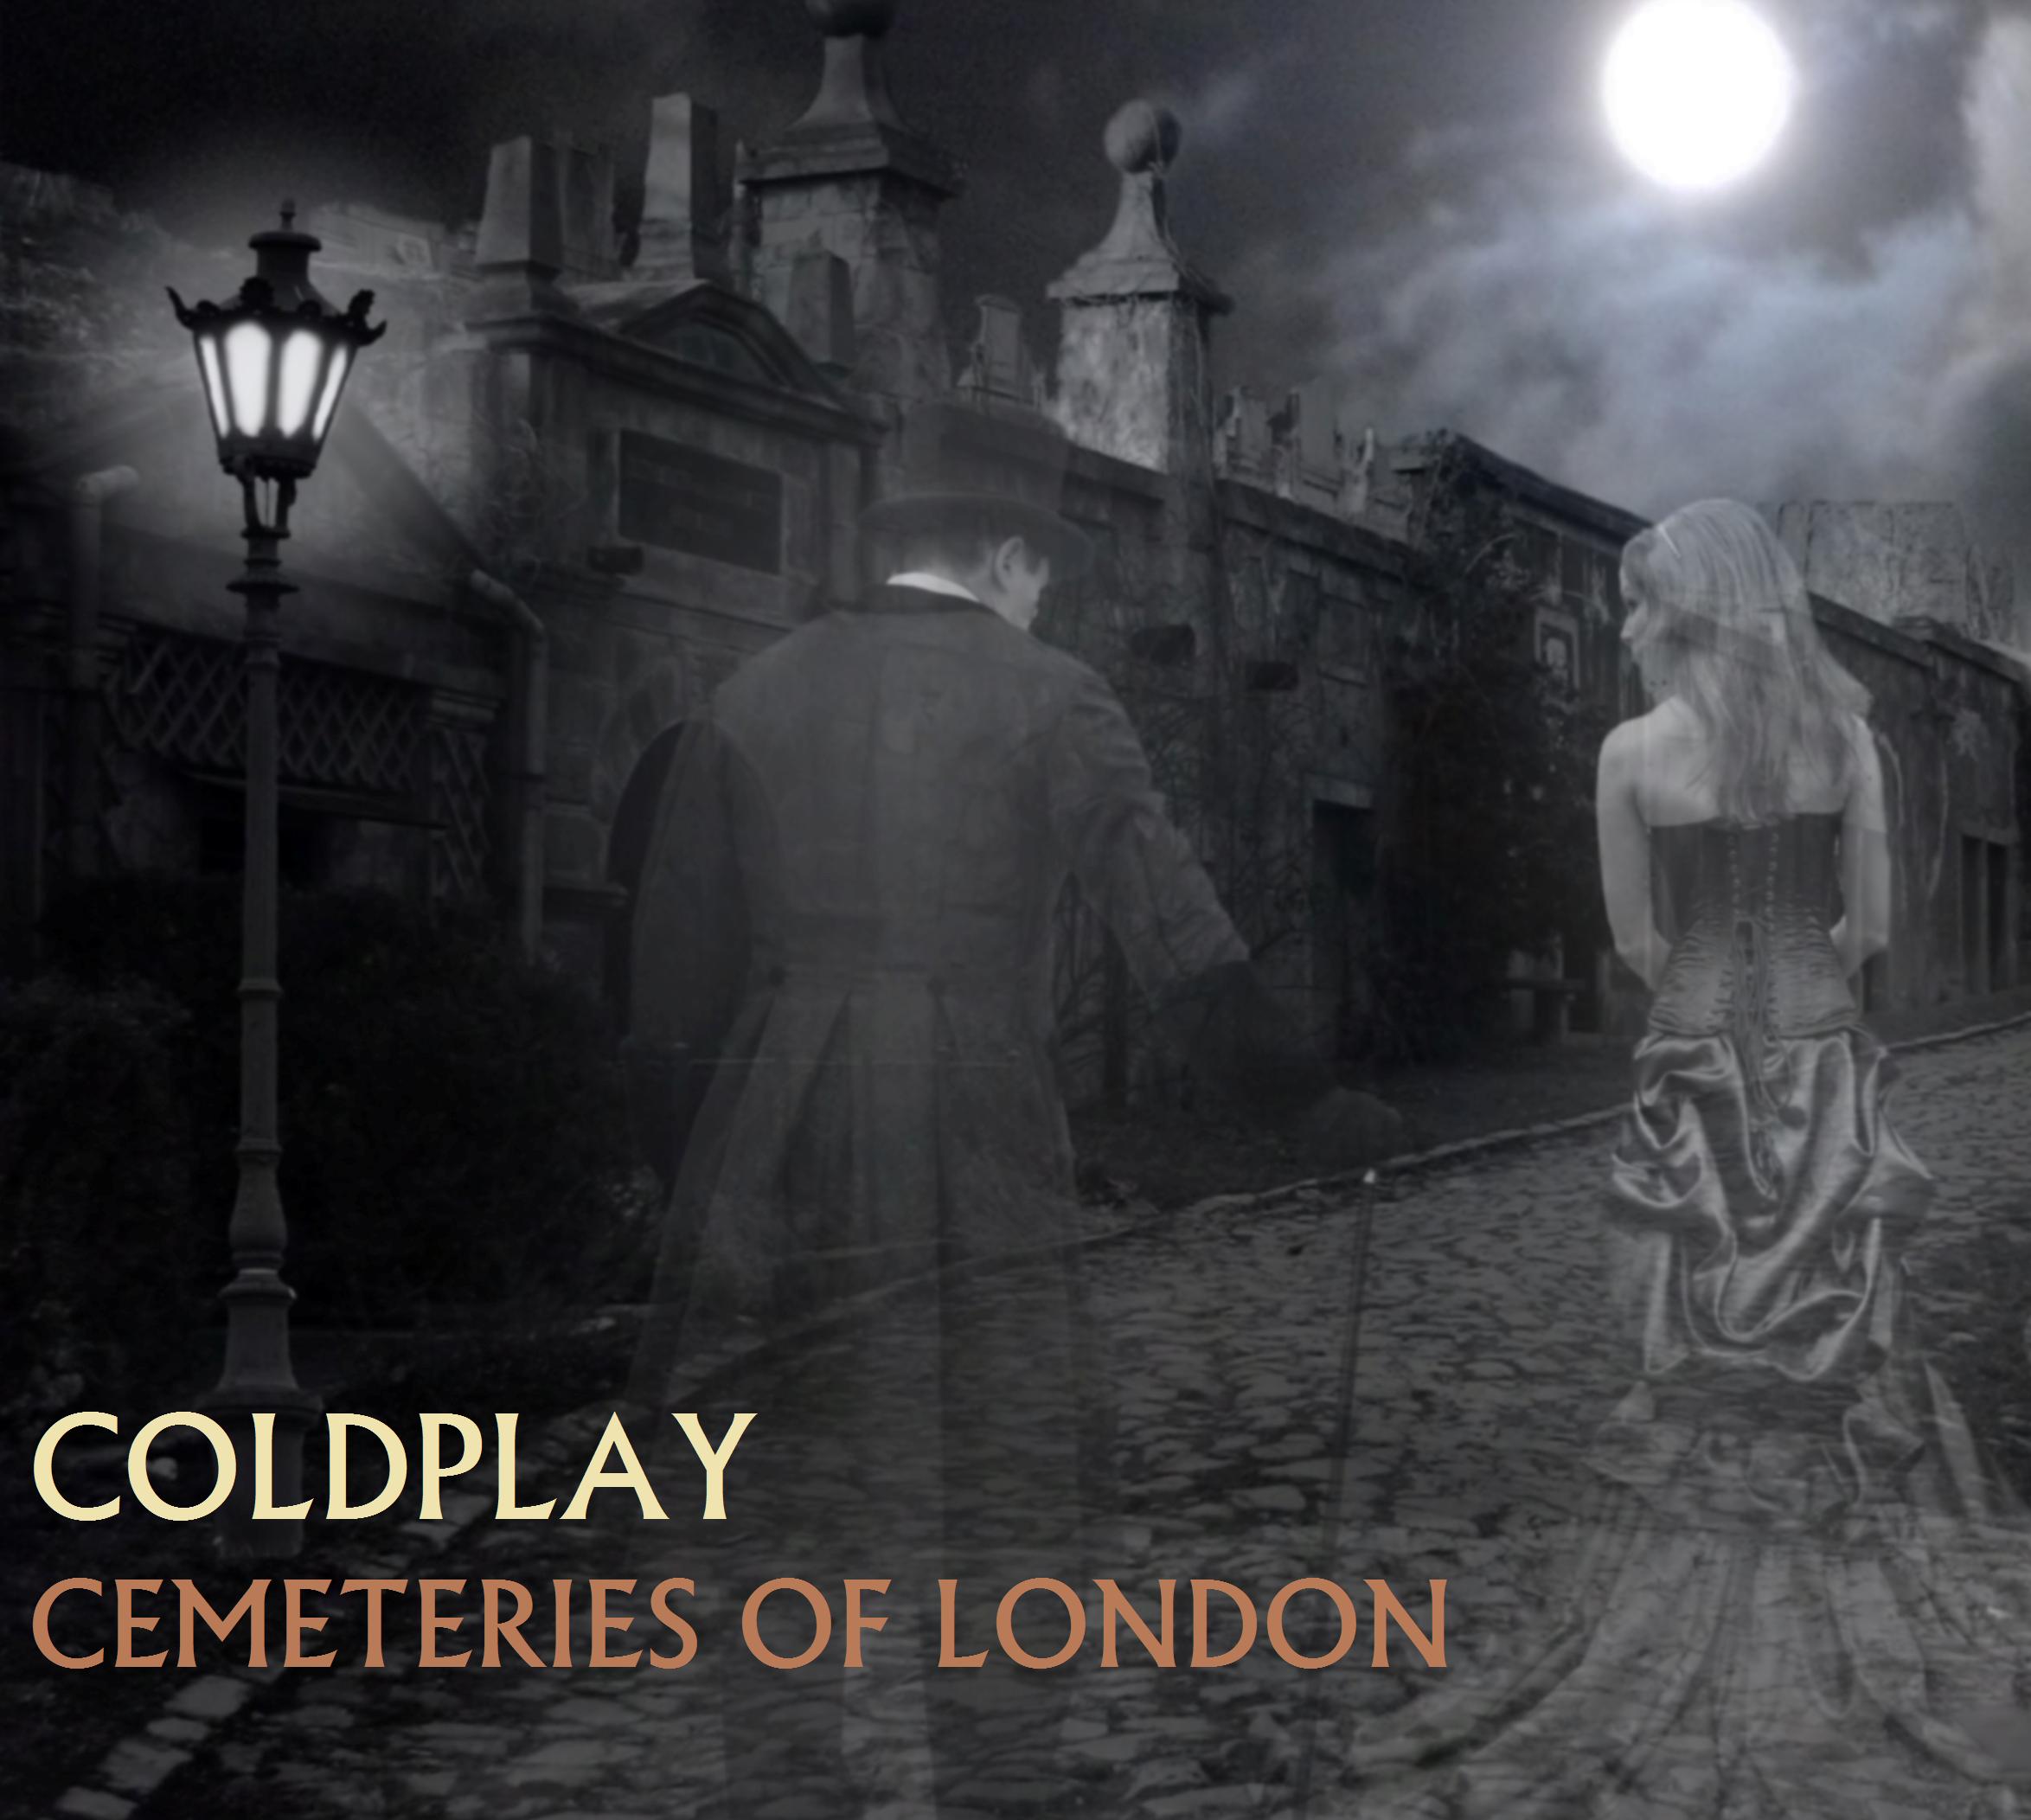 Coldplay - Cemeteries Of London by darko137 on DeviantArt